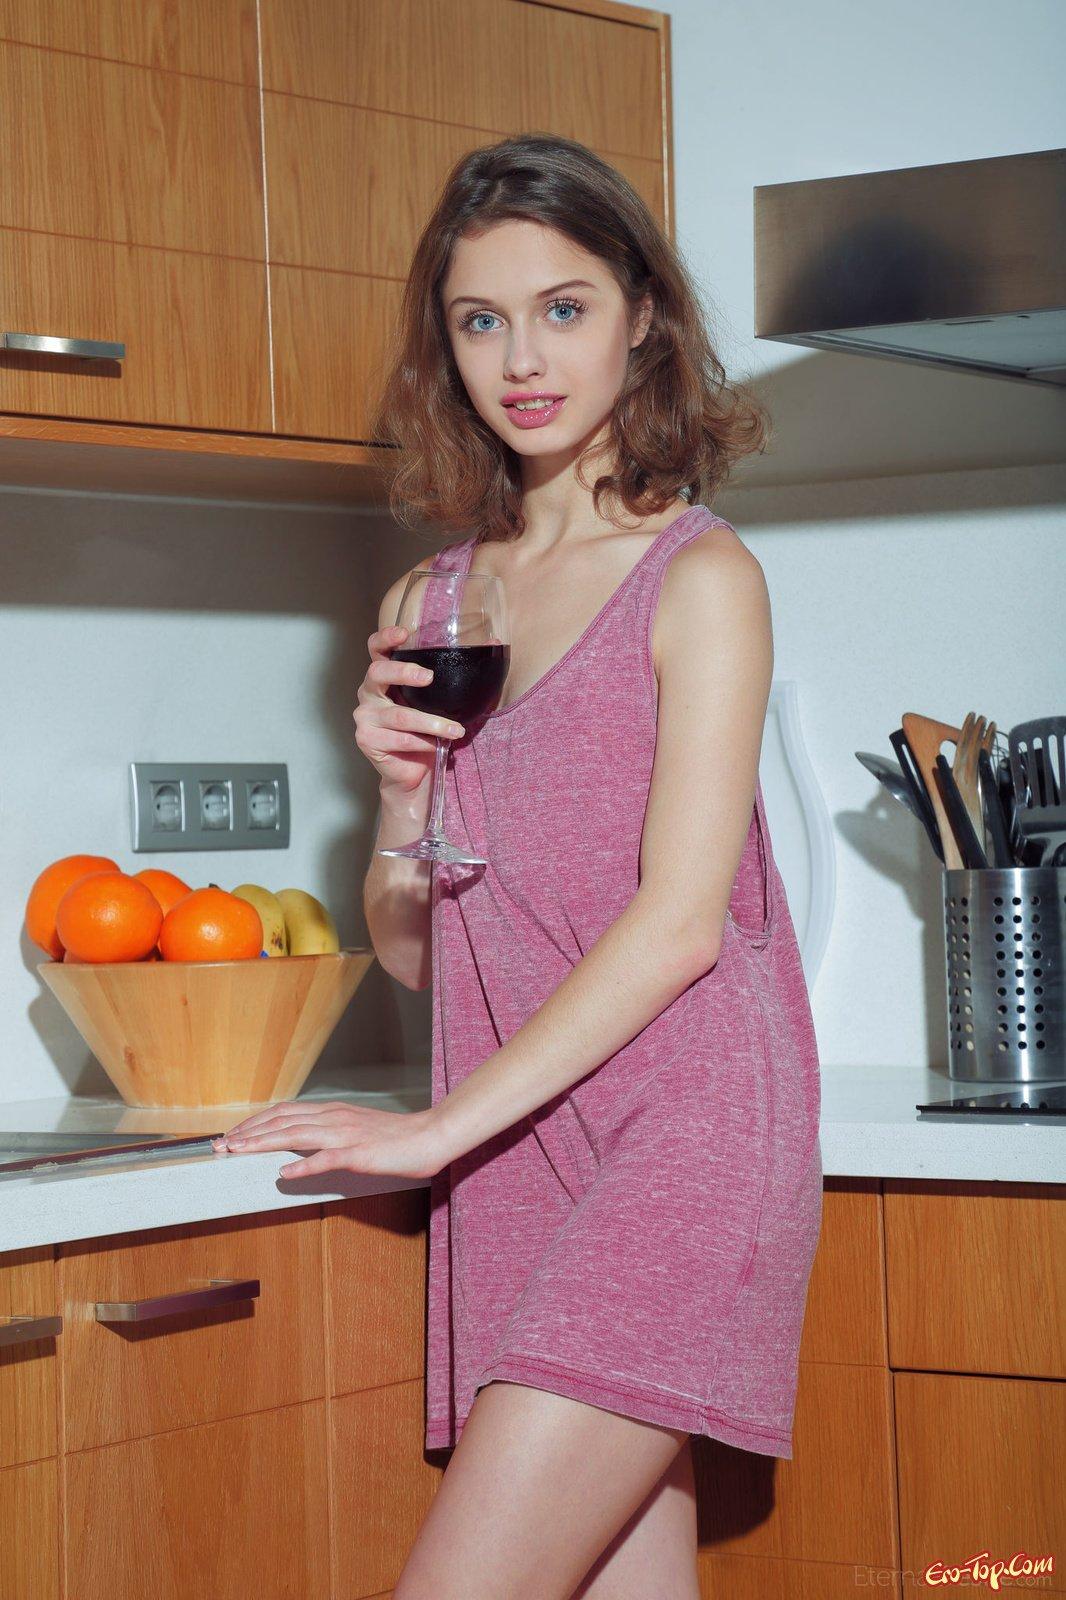 Сняла трусики на кухне 25 фотография